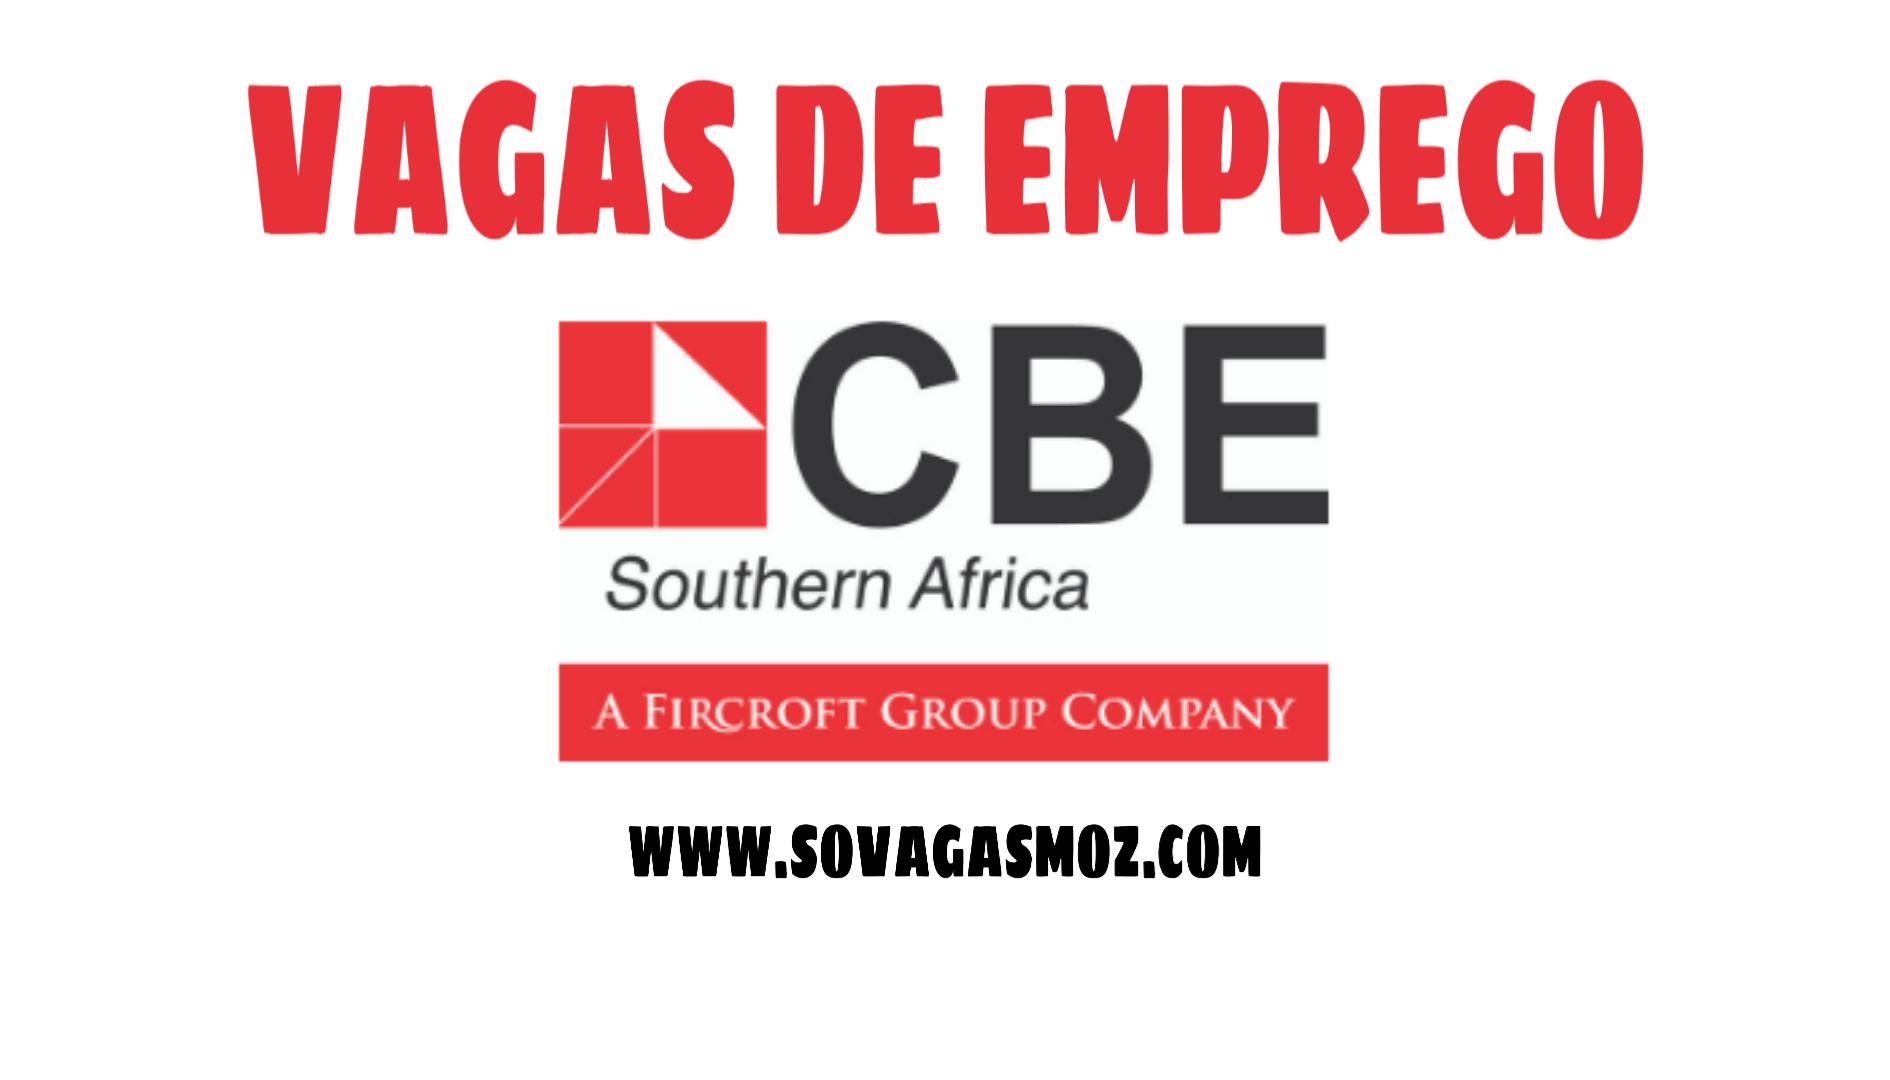 Sovagasmoz - Recrutamento CBE Southern Africa